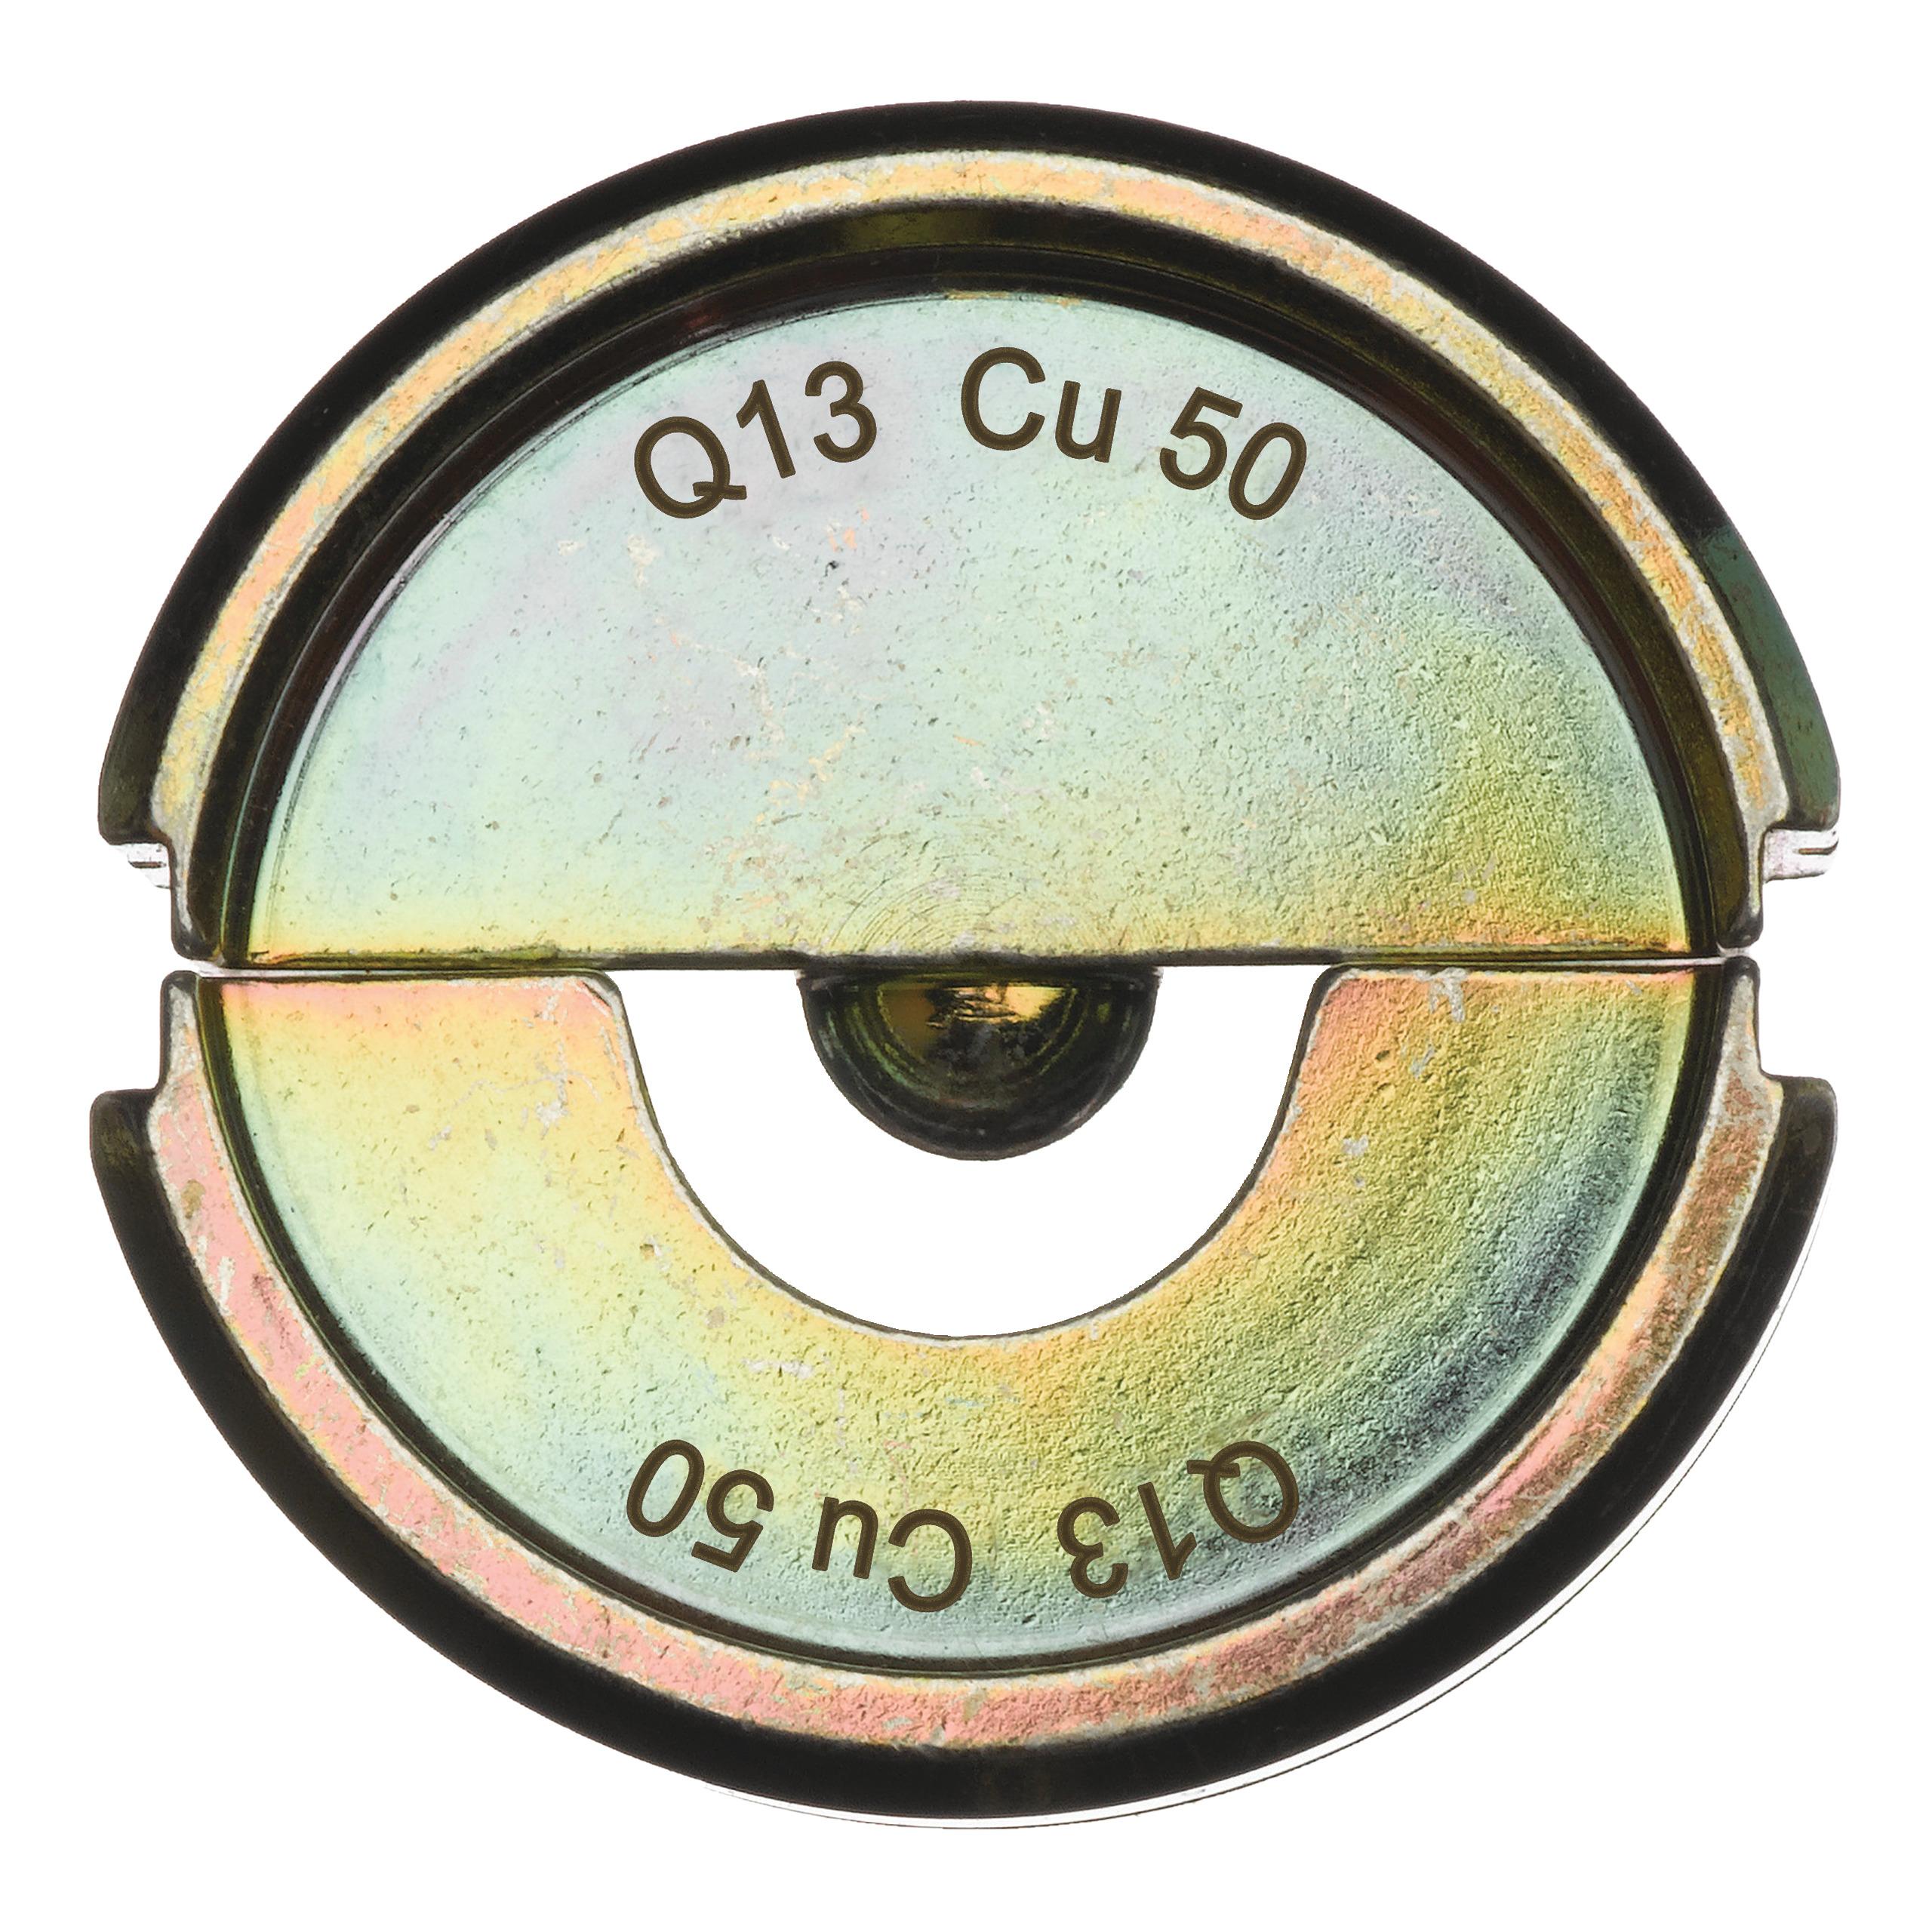 Q13 CU 50-1PC Pojistný kroužek